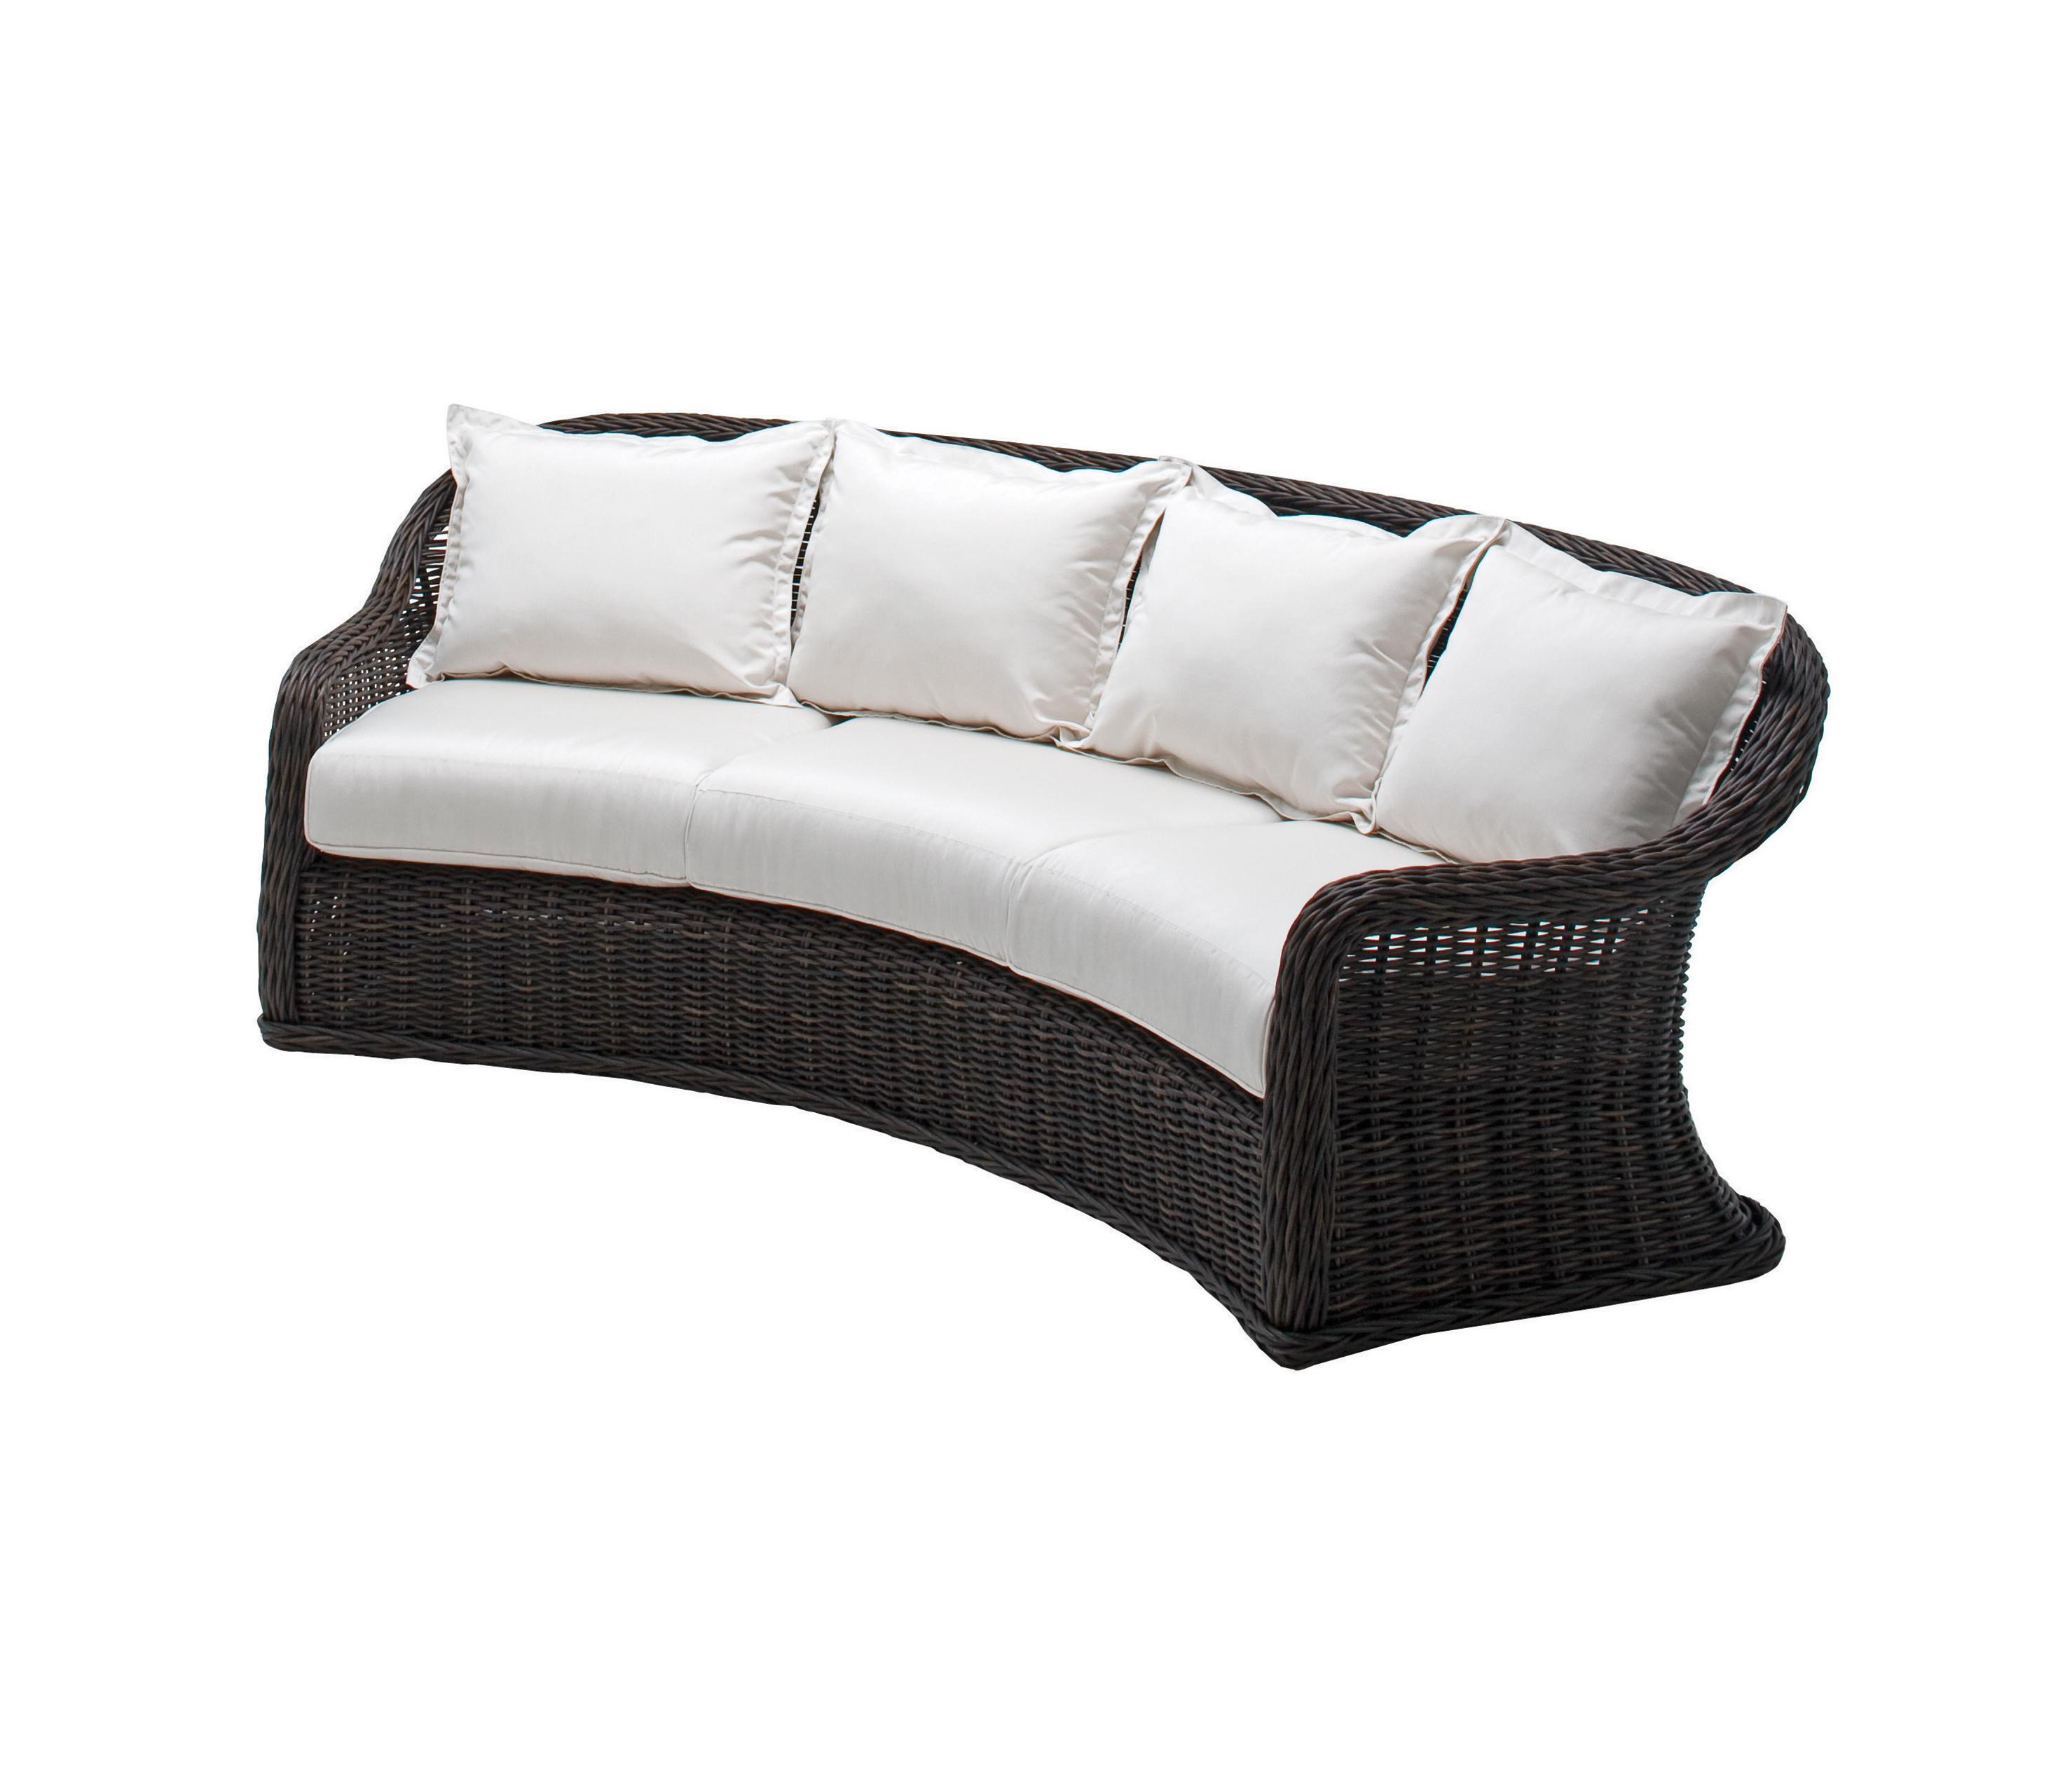 Havana Deep Seating Curved Sofa Gartensofas Von Gloster Furniture Gmbh Architonic